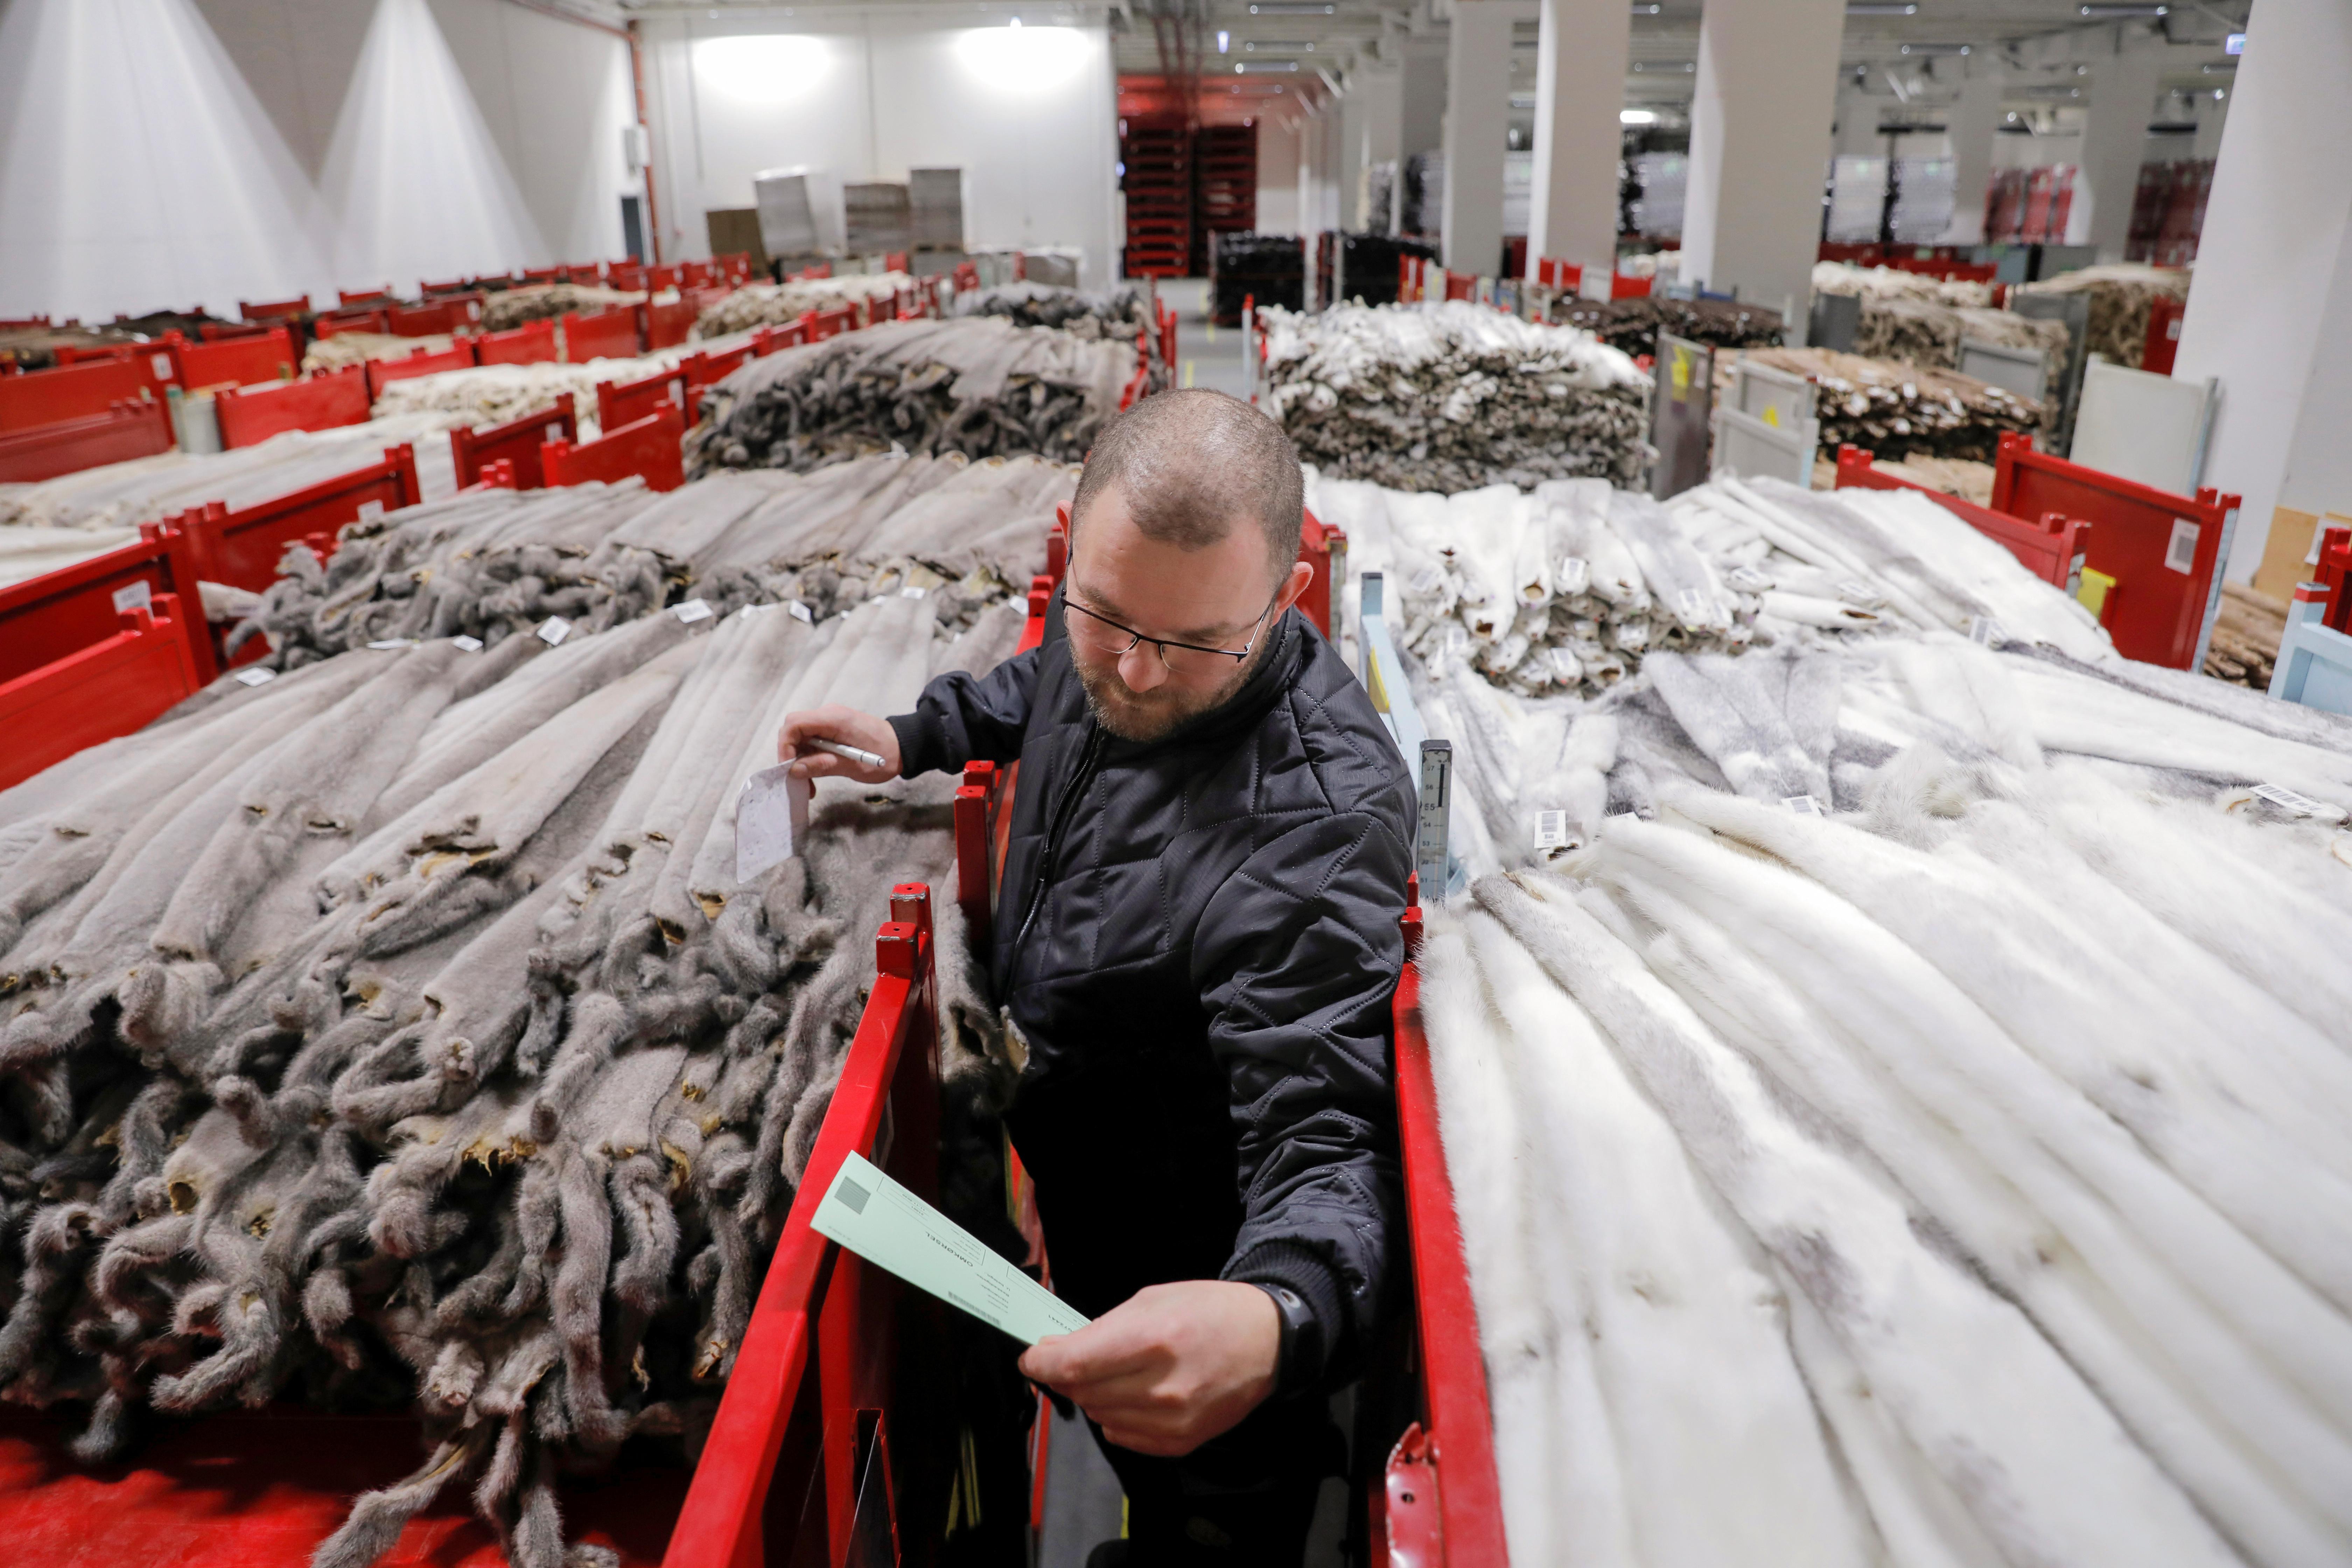 Kopenhagen Fur employee Bjarne Bendtsen works amongst mink pelts in the company's storage area, during the outbreak of the coronavirus disease (COVID-19) in Glostrup, Denmark, December 7, 2020.  REUTERS/Andrew Kelly